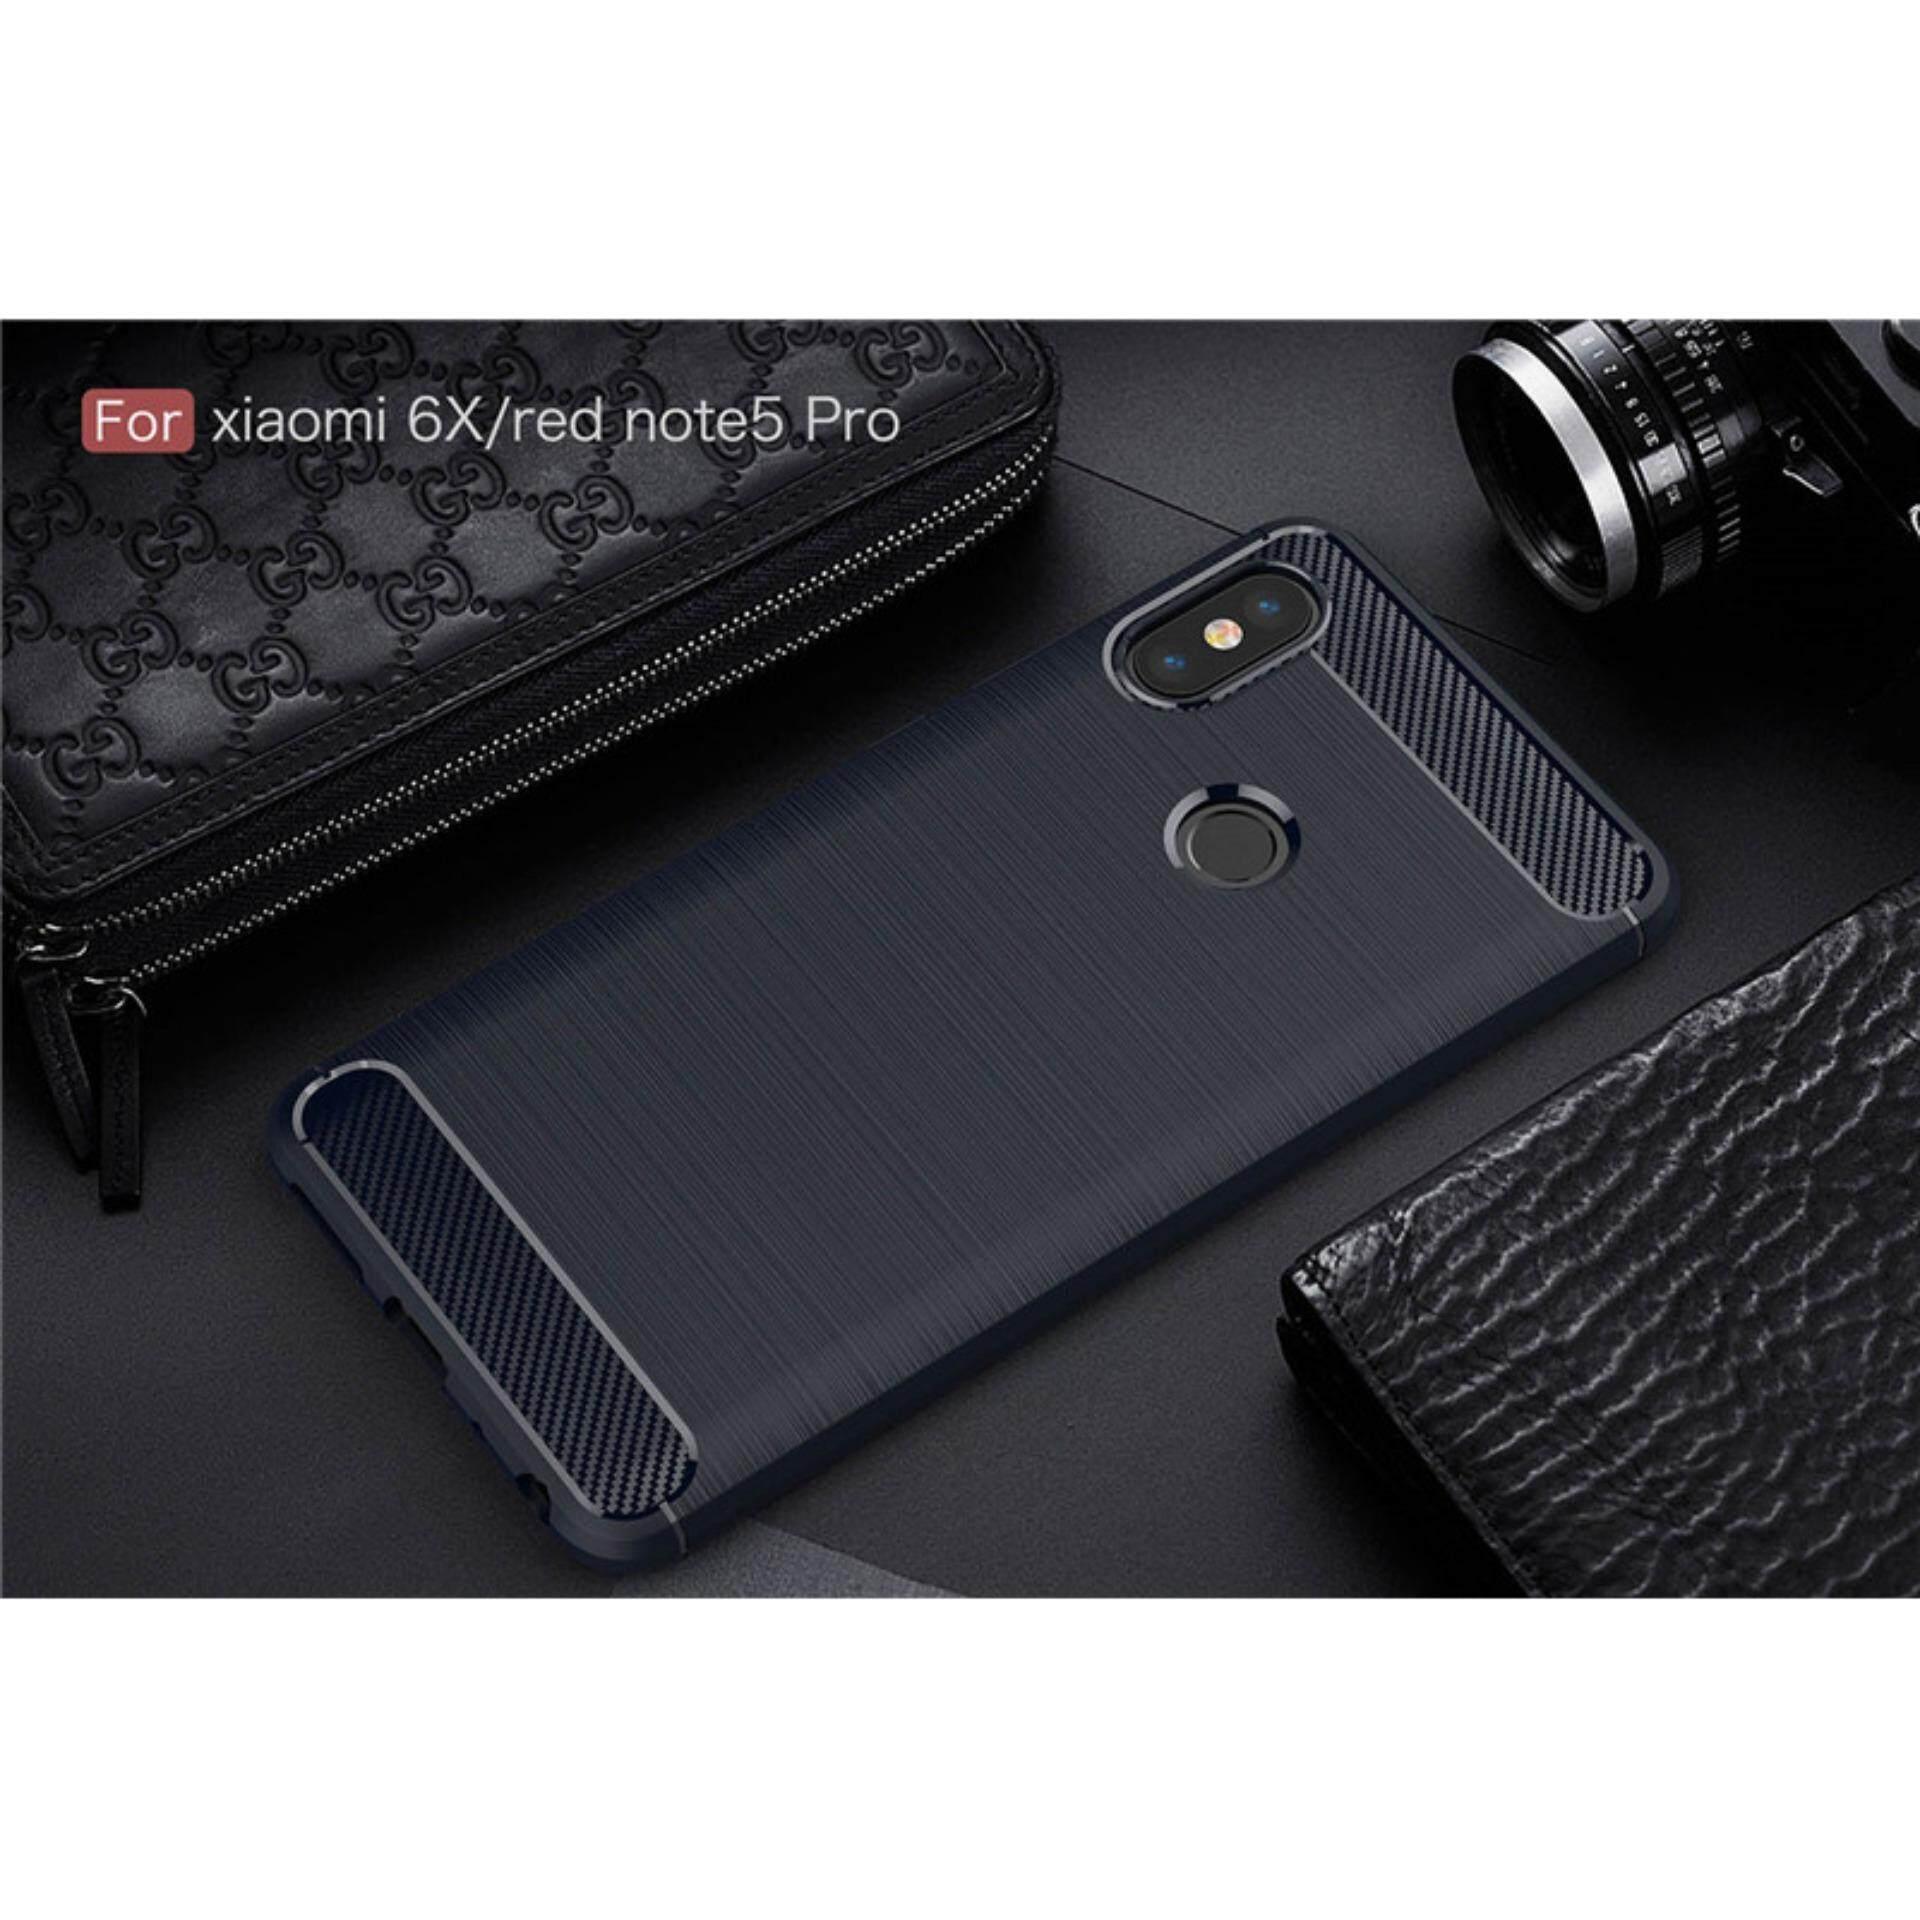 Detail Gambar Karbon Kasar Pelindung Sarung Case untuk Xiaomi Redmi Note 5 Pro-Internasional Terbaru